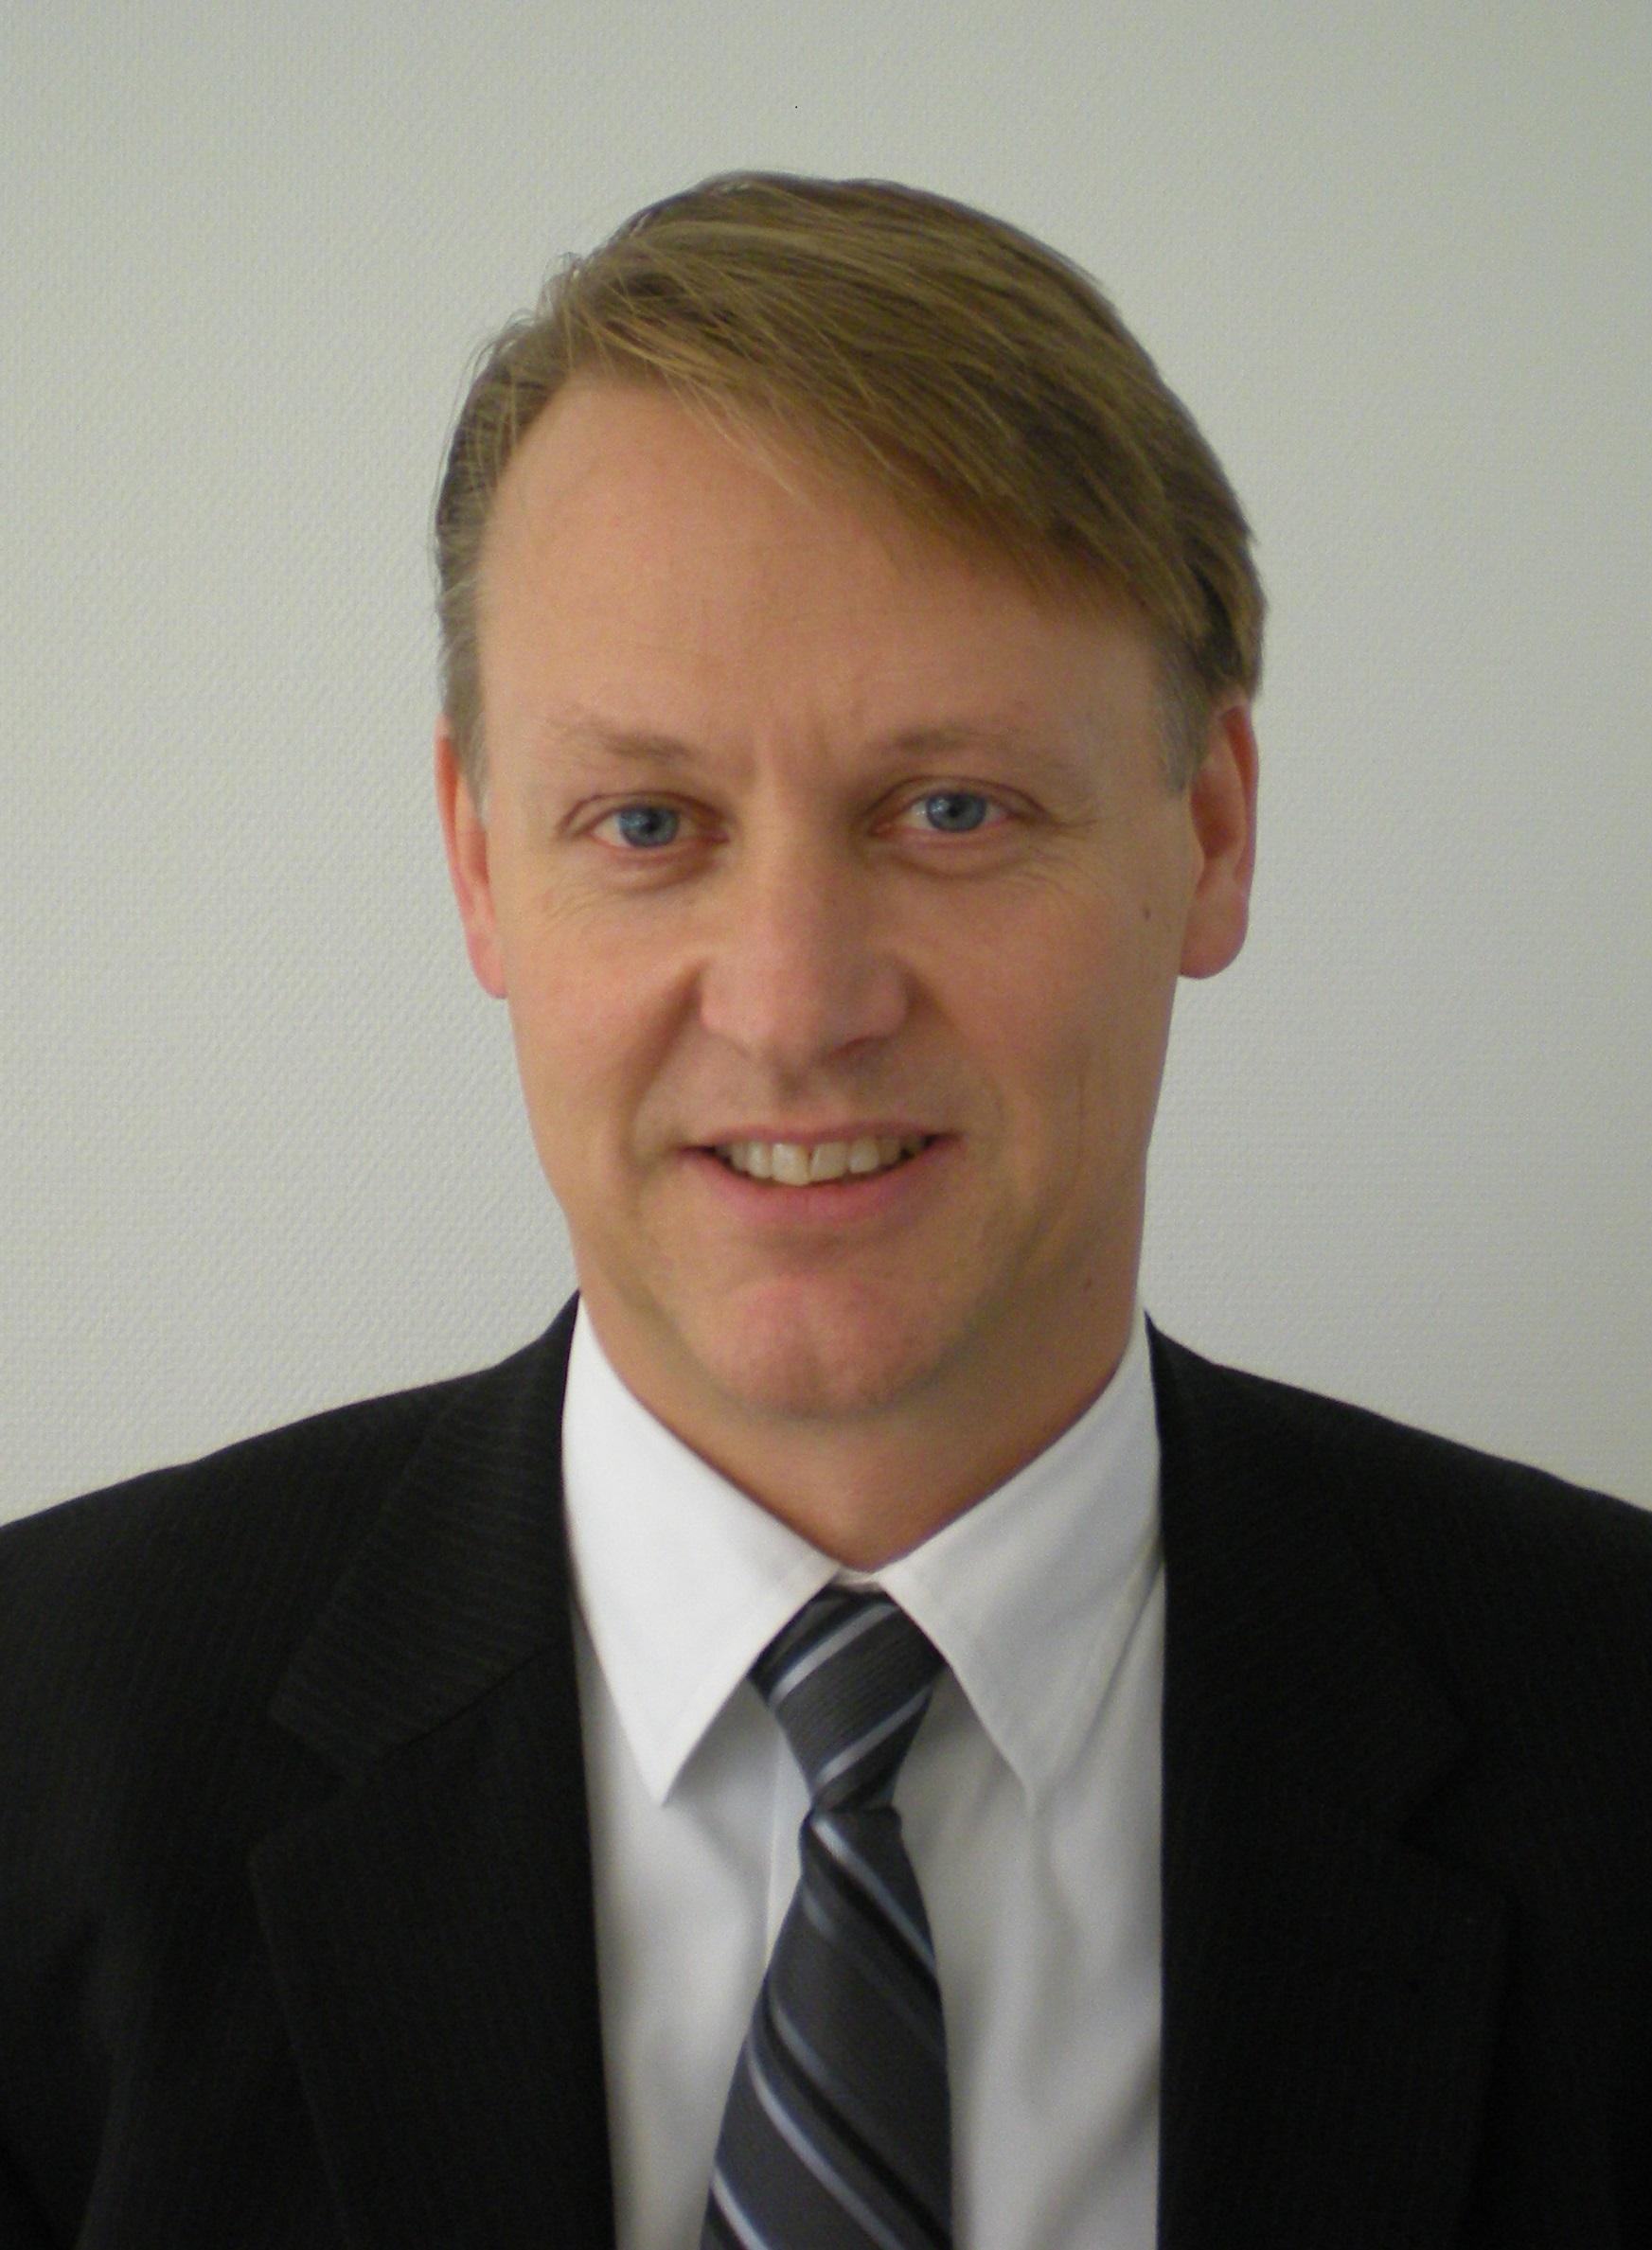 Jan Otterling